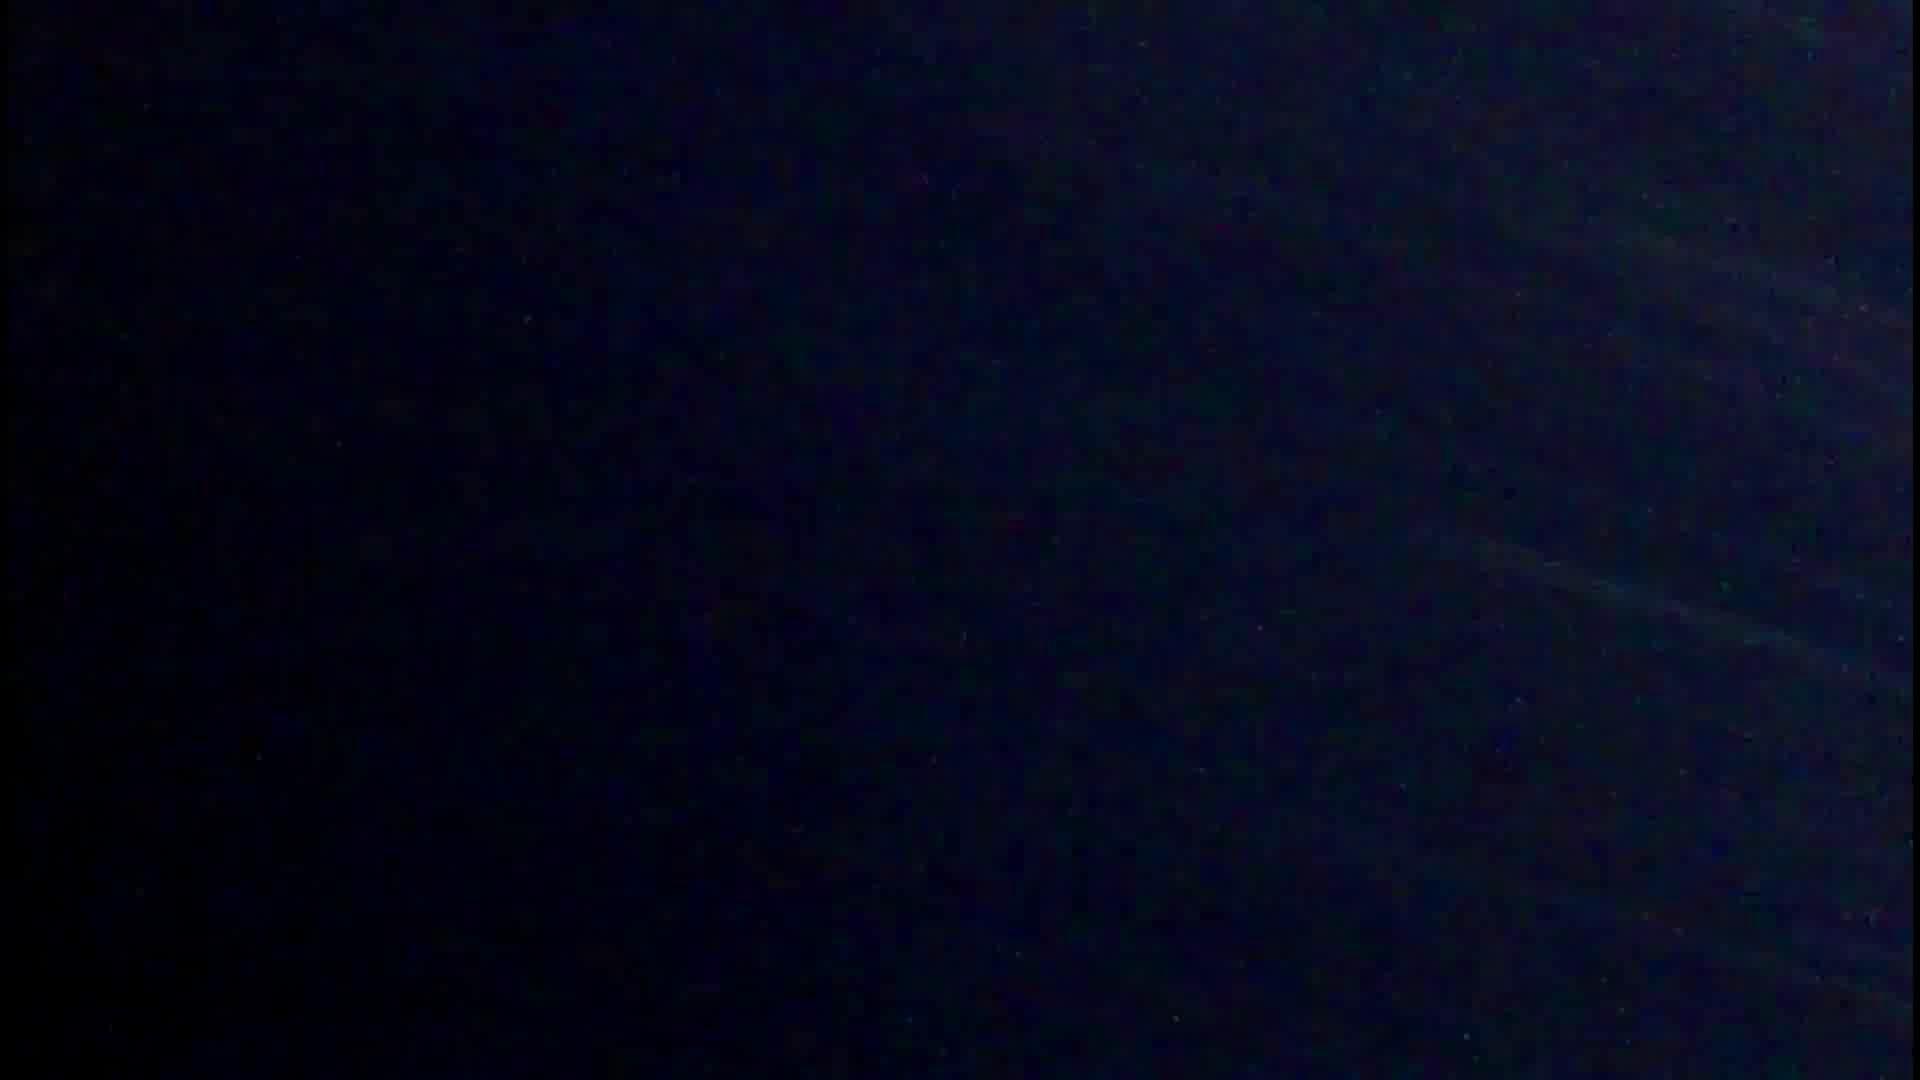 SPYさん初投稿!マンション覗き!5000K!ハイビジョン撮影VOL.04(現役ラグビー部大学生編) 完全無修正版 男同士動画 74枚 26